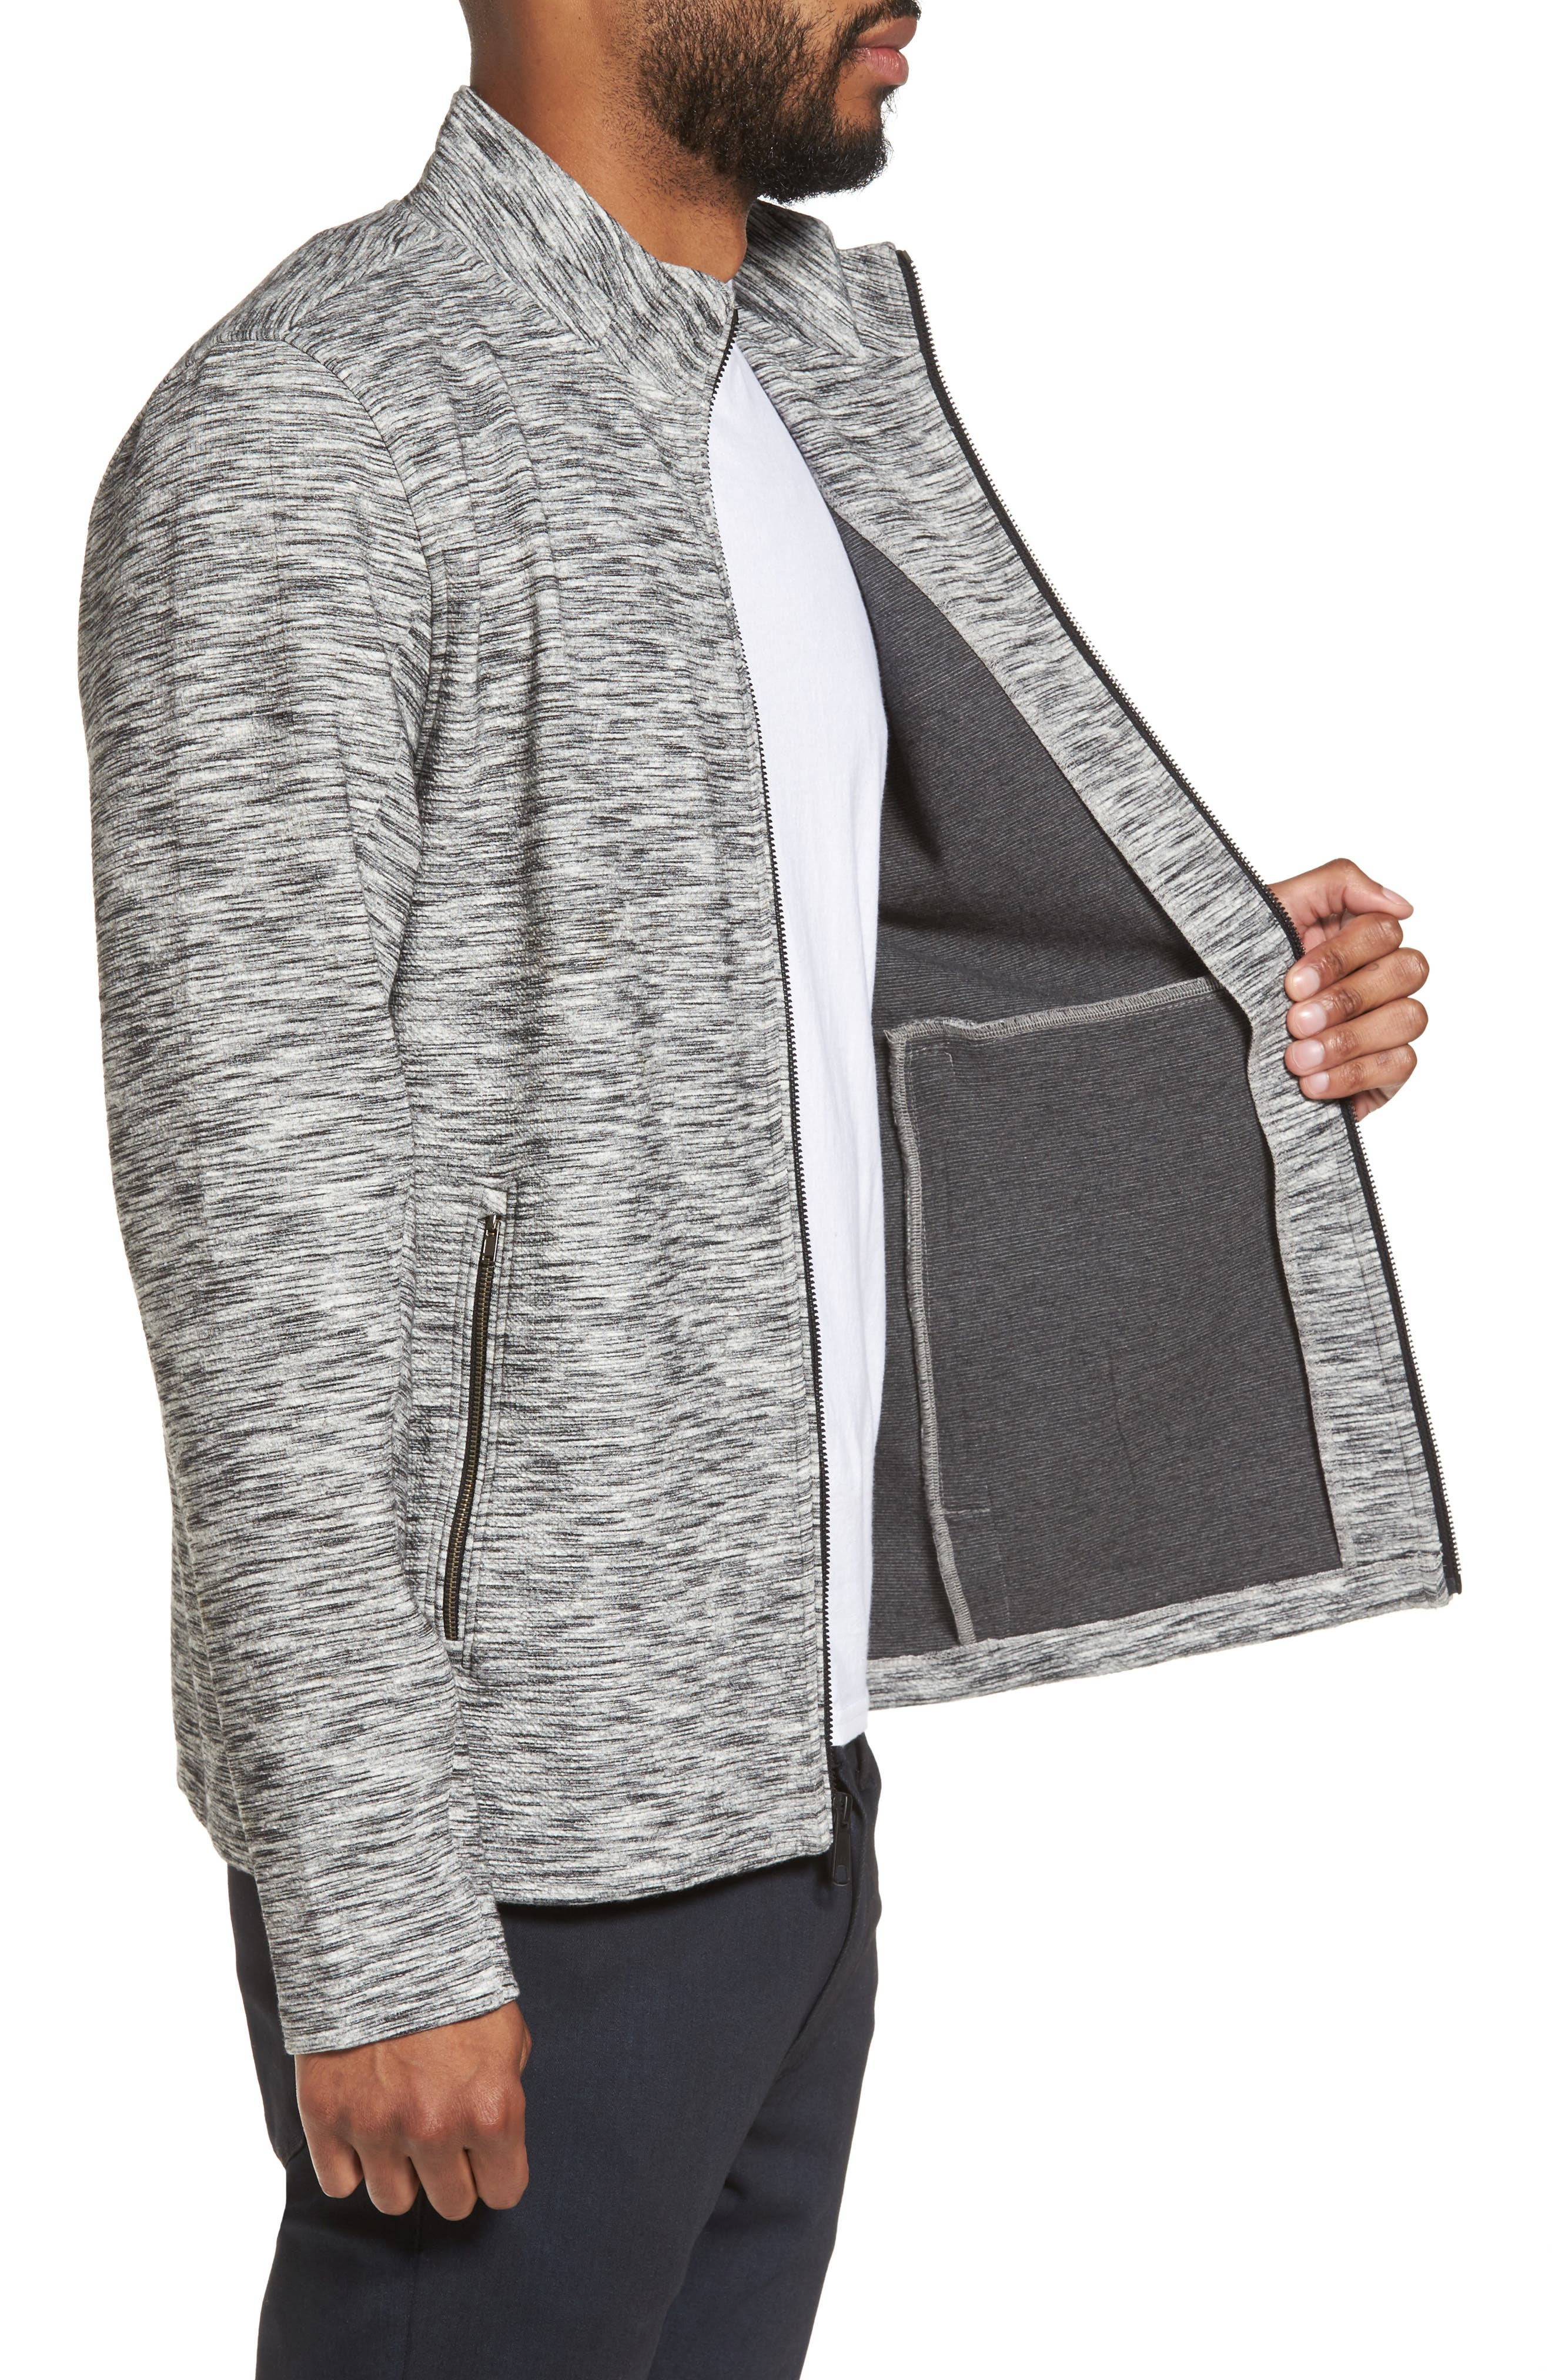 Knit Bomber Jacket,                             Alternate thumbnail 3, color,                             Grey Lunar Spacedye